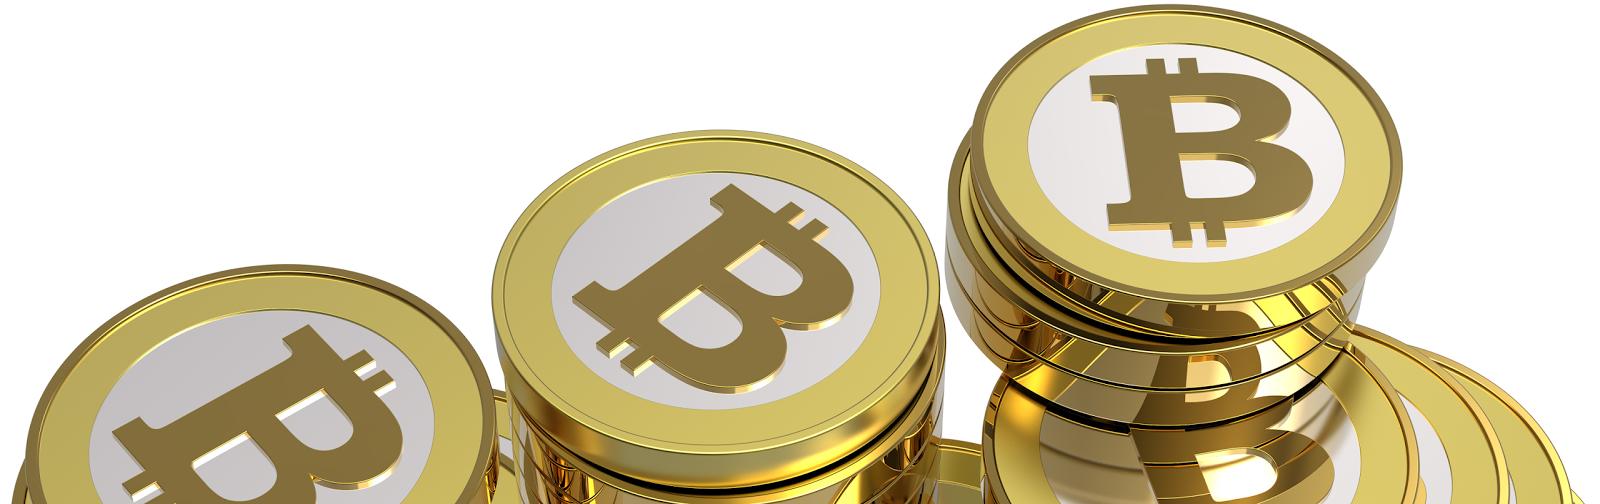 1 bitcoin stock